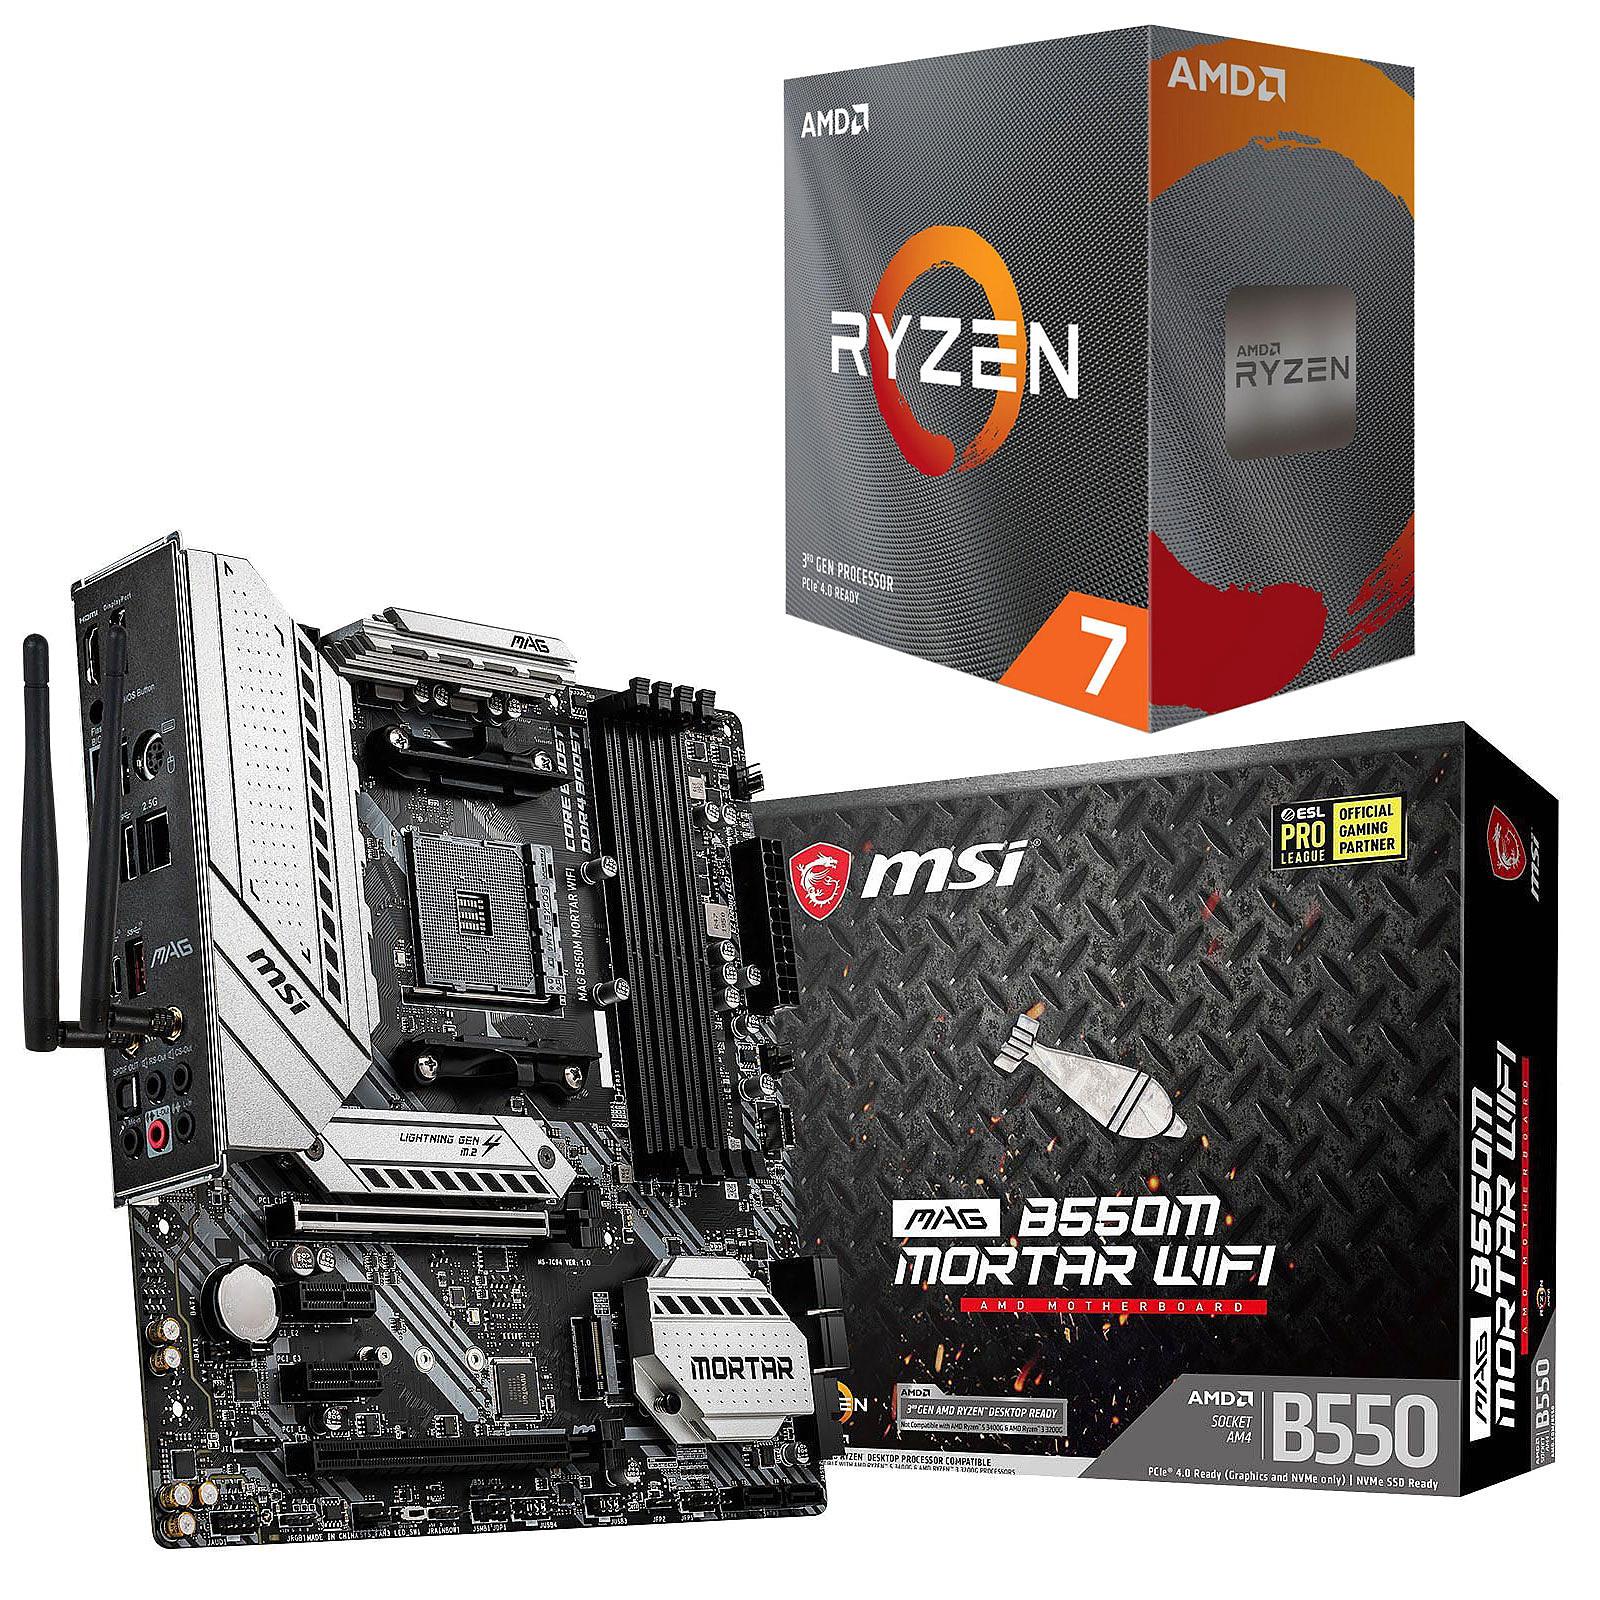 Kit Upgrade PC AMD Ryzen 7 3800XT MSI MAG B550M MORTAR WIFI